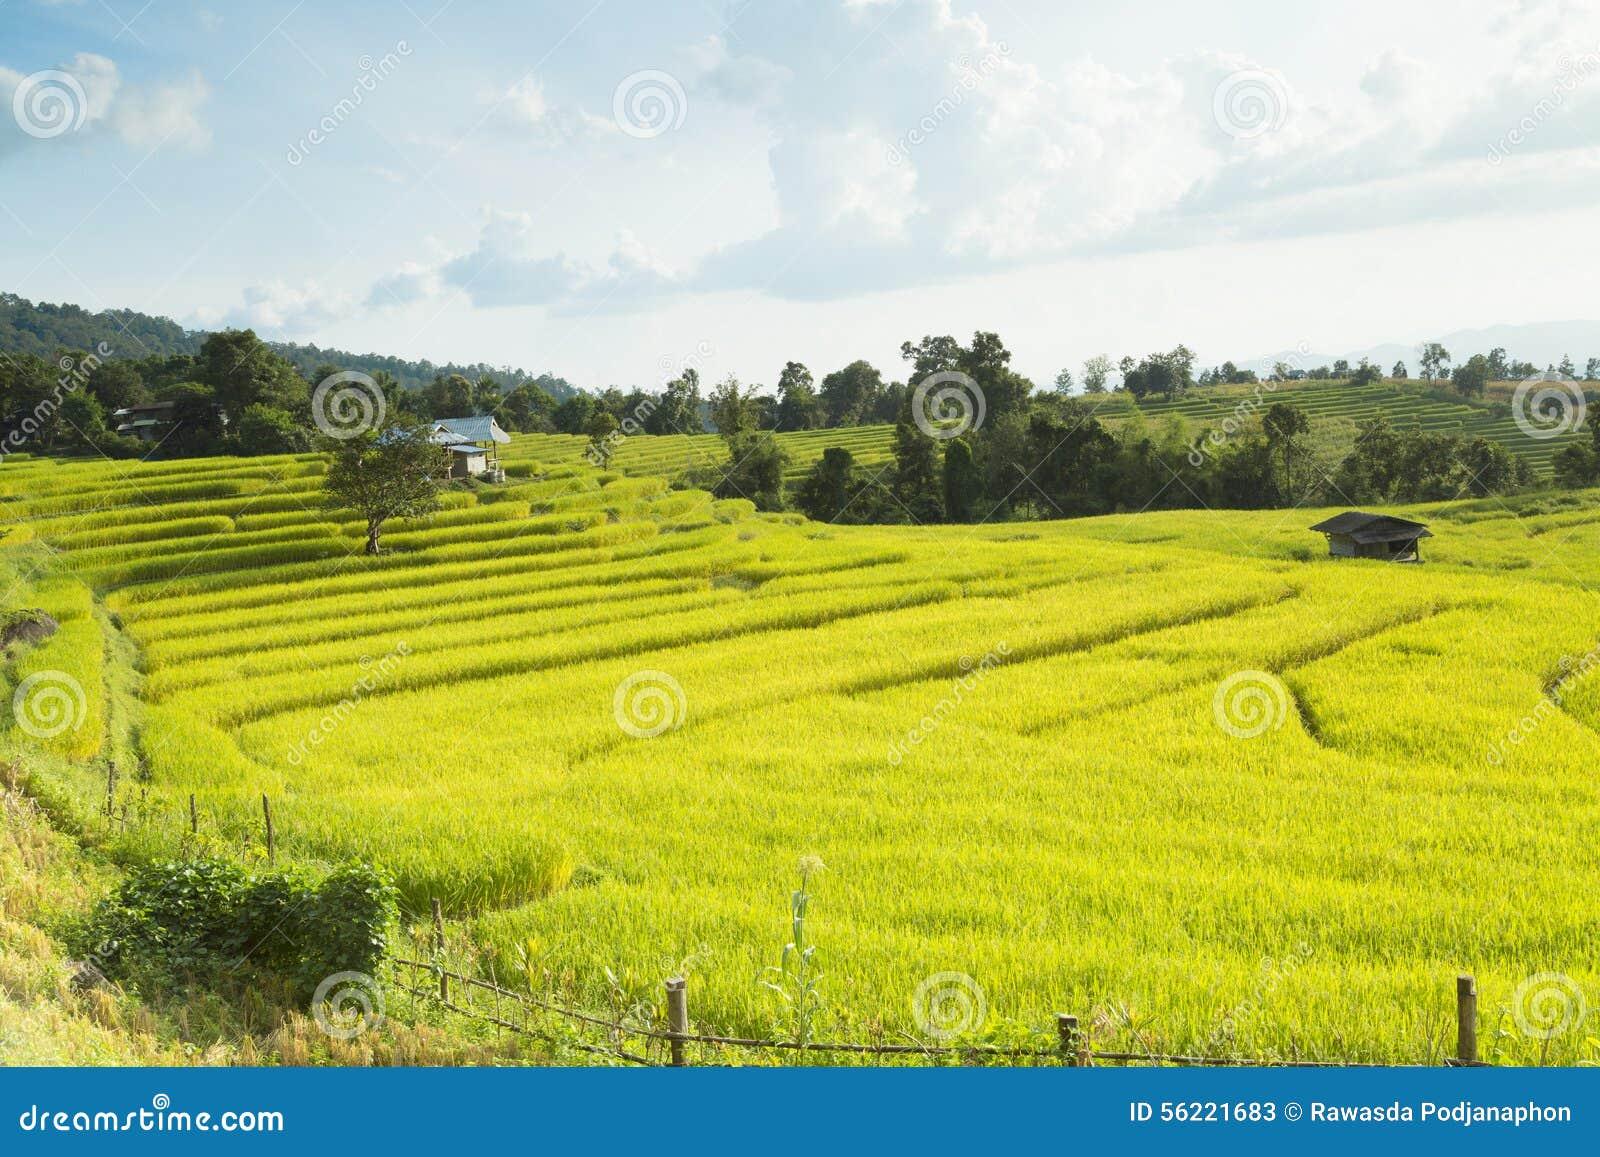 Mae Chaem Thailand  city photos gallery : Rice Fields On Terraced Of Mae Chaem, Ching Mai, Northern Thaila Stock ...